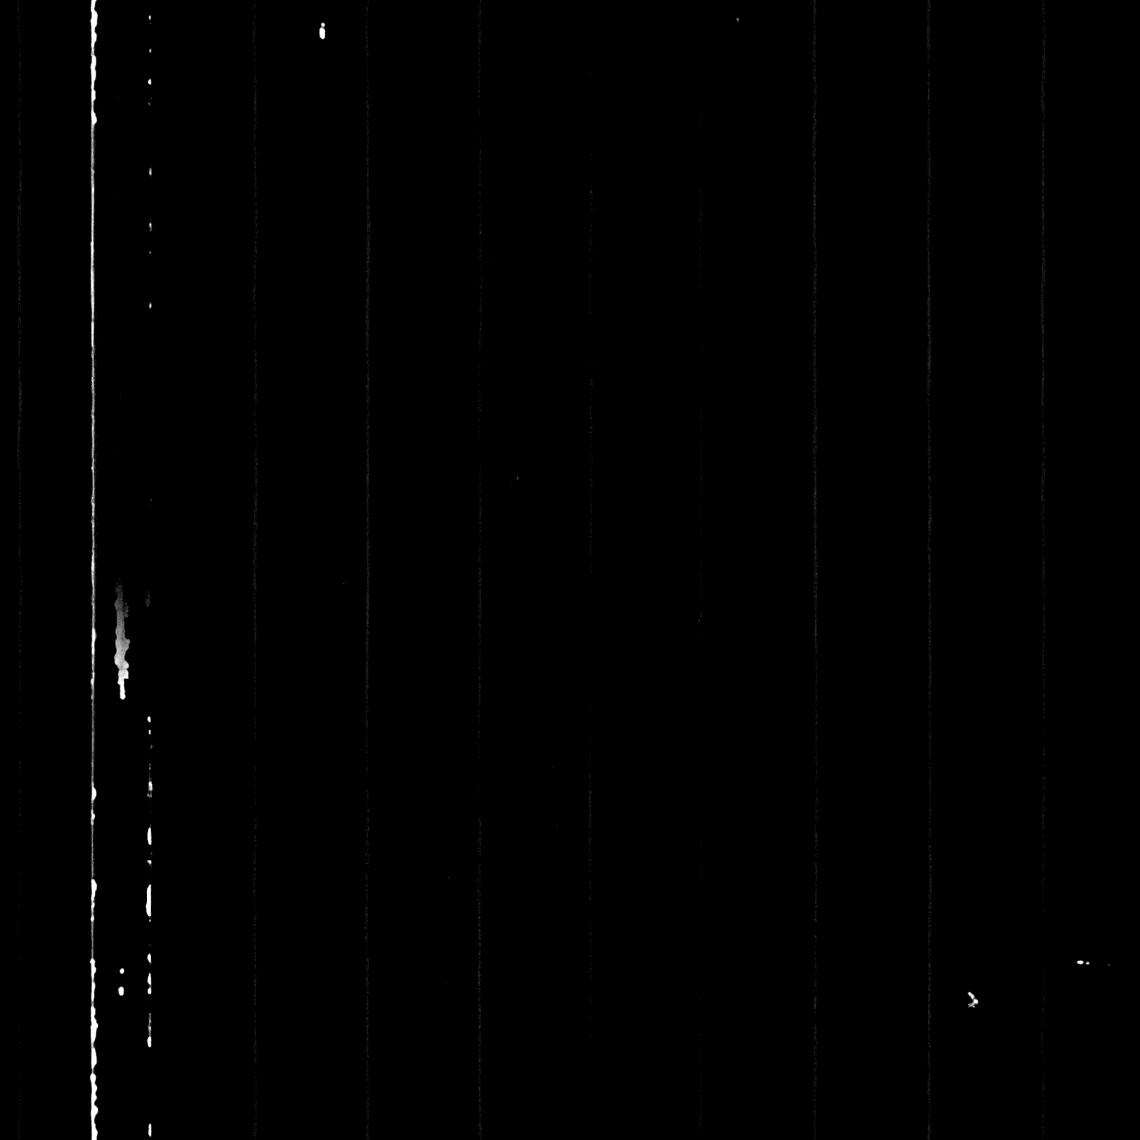 Corrugated-Metal-01-Metallic